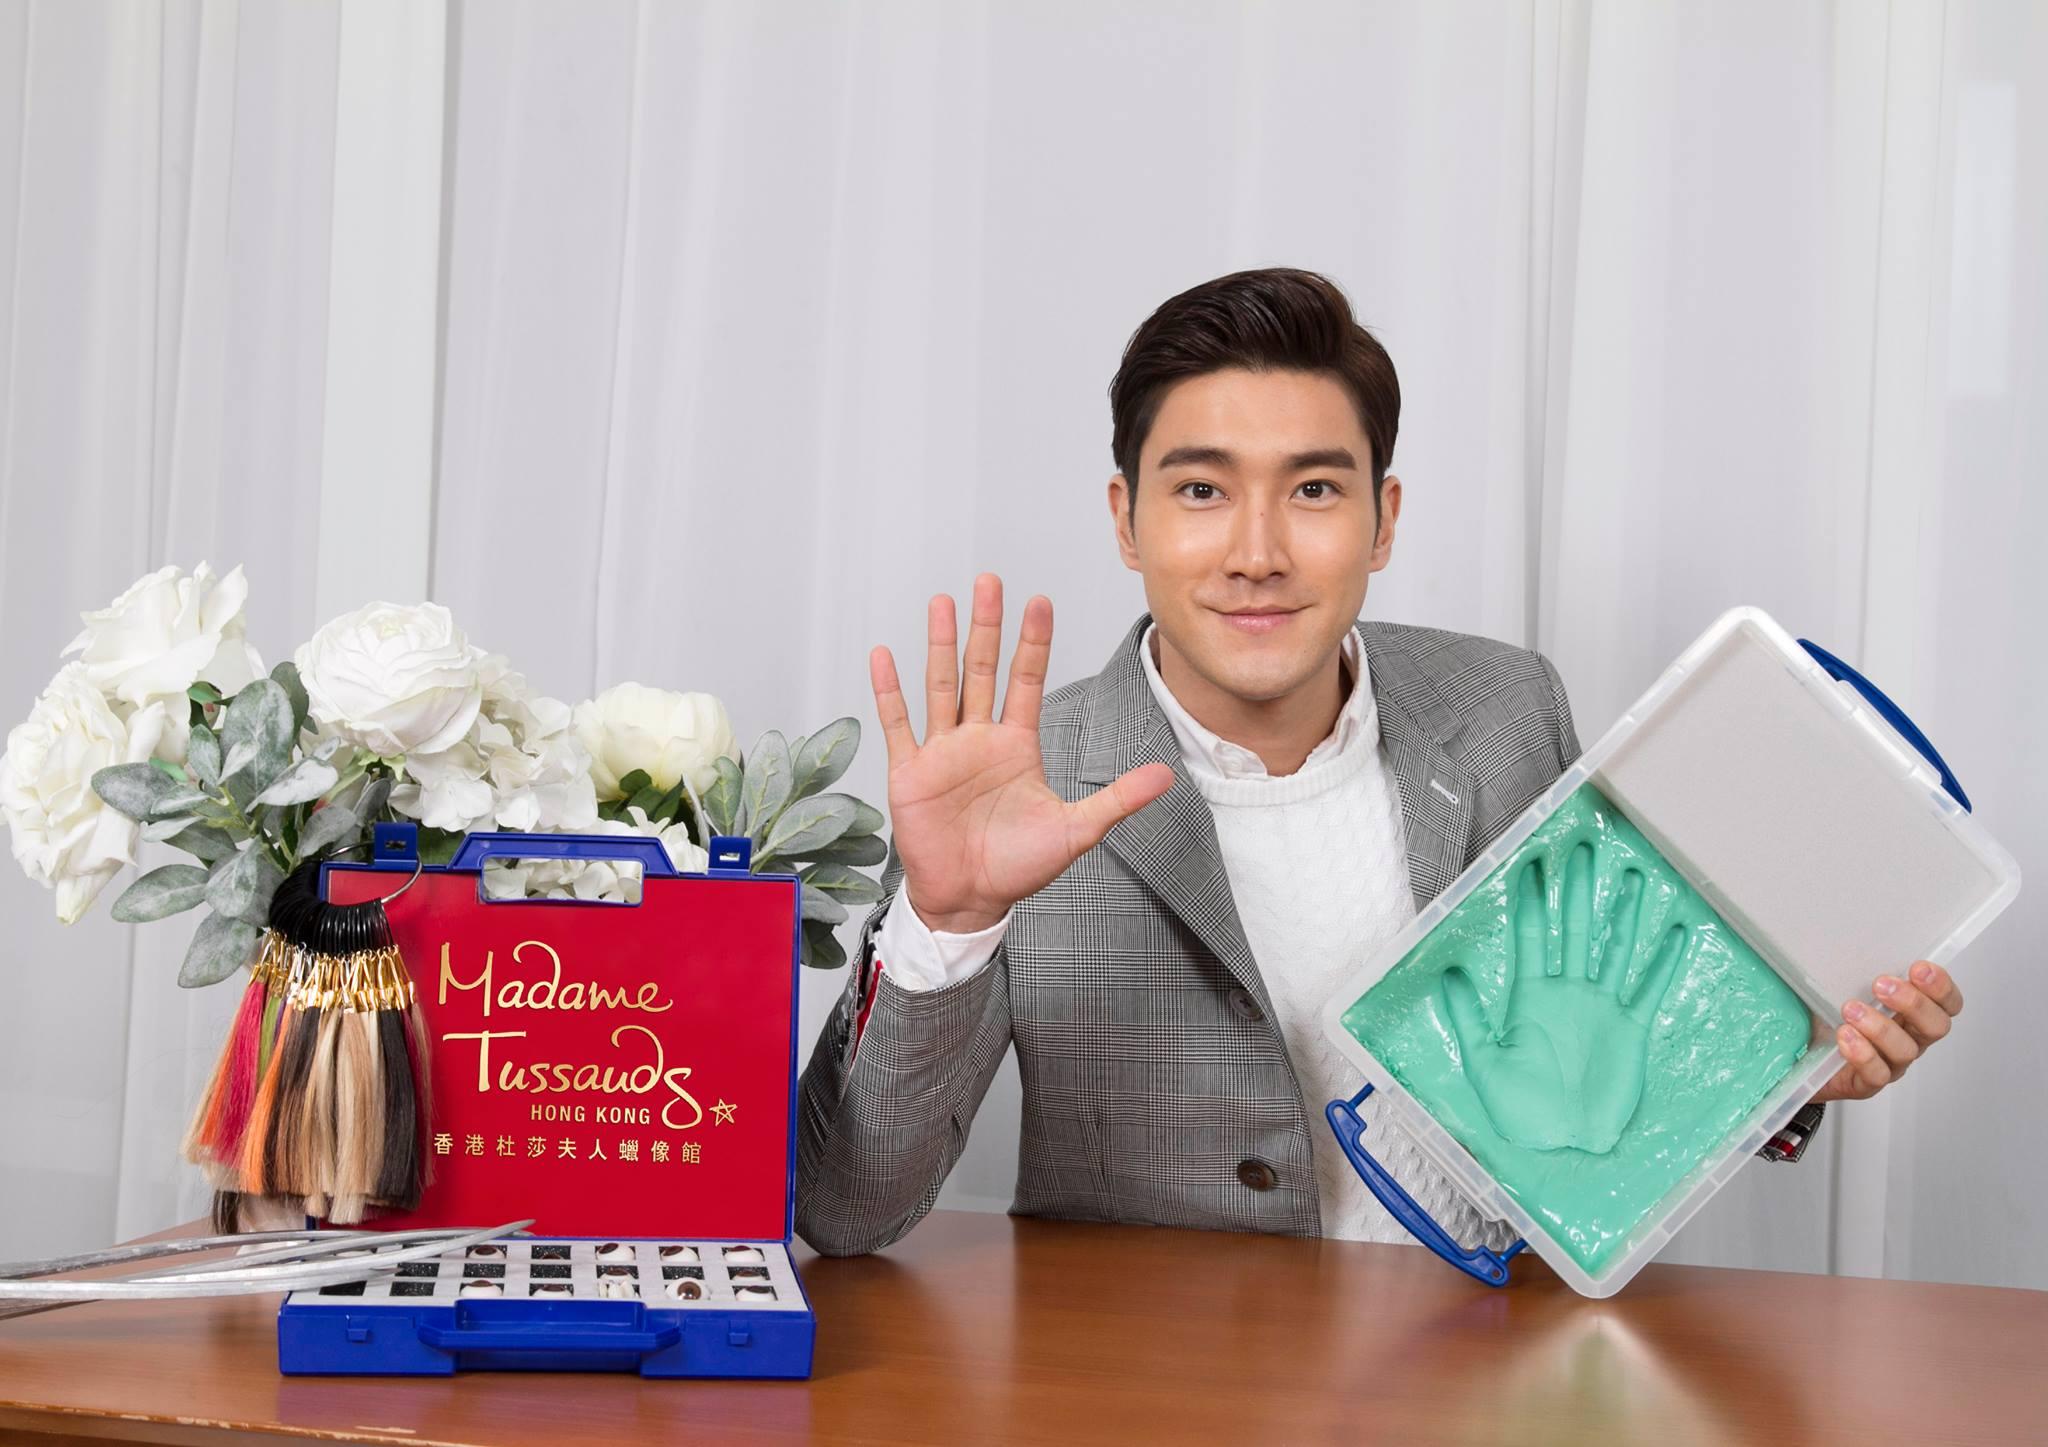 Madam Tussauds Siwon 20150422